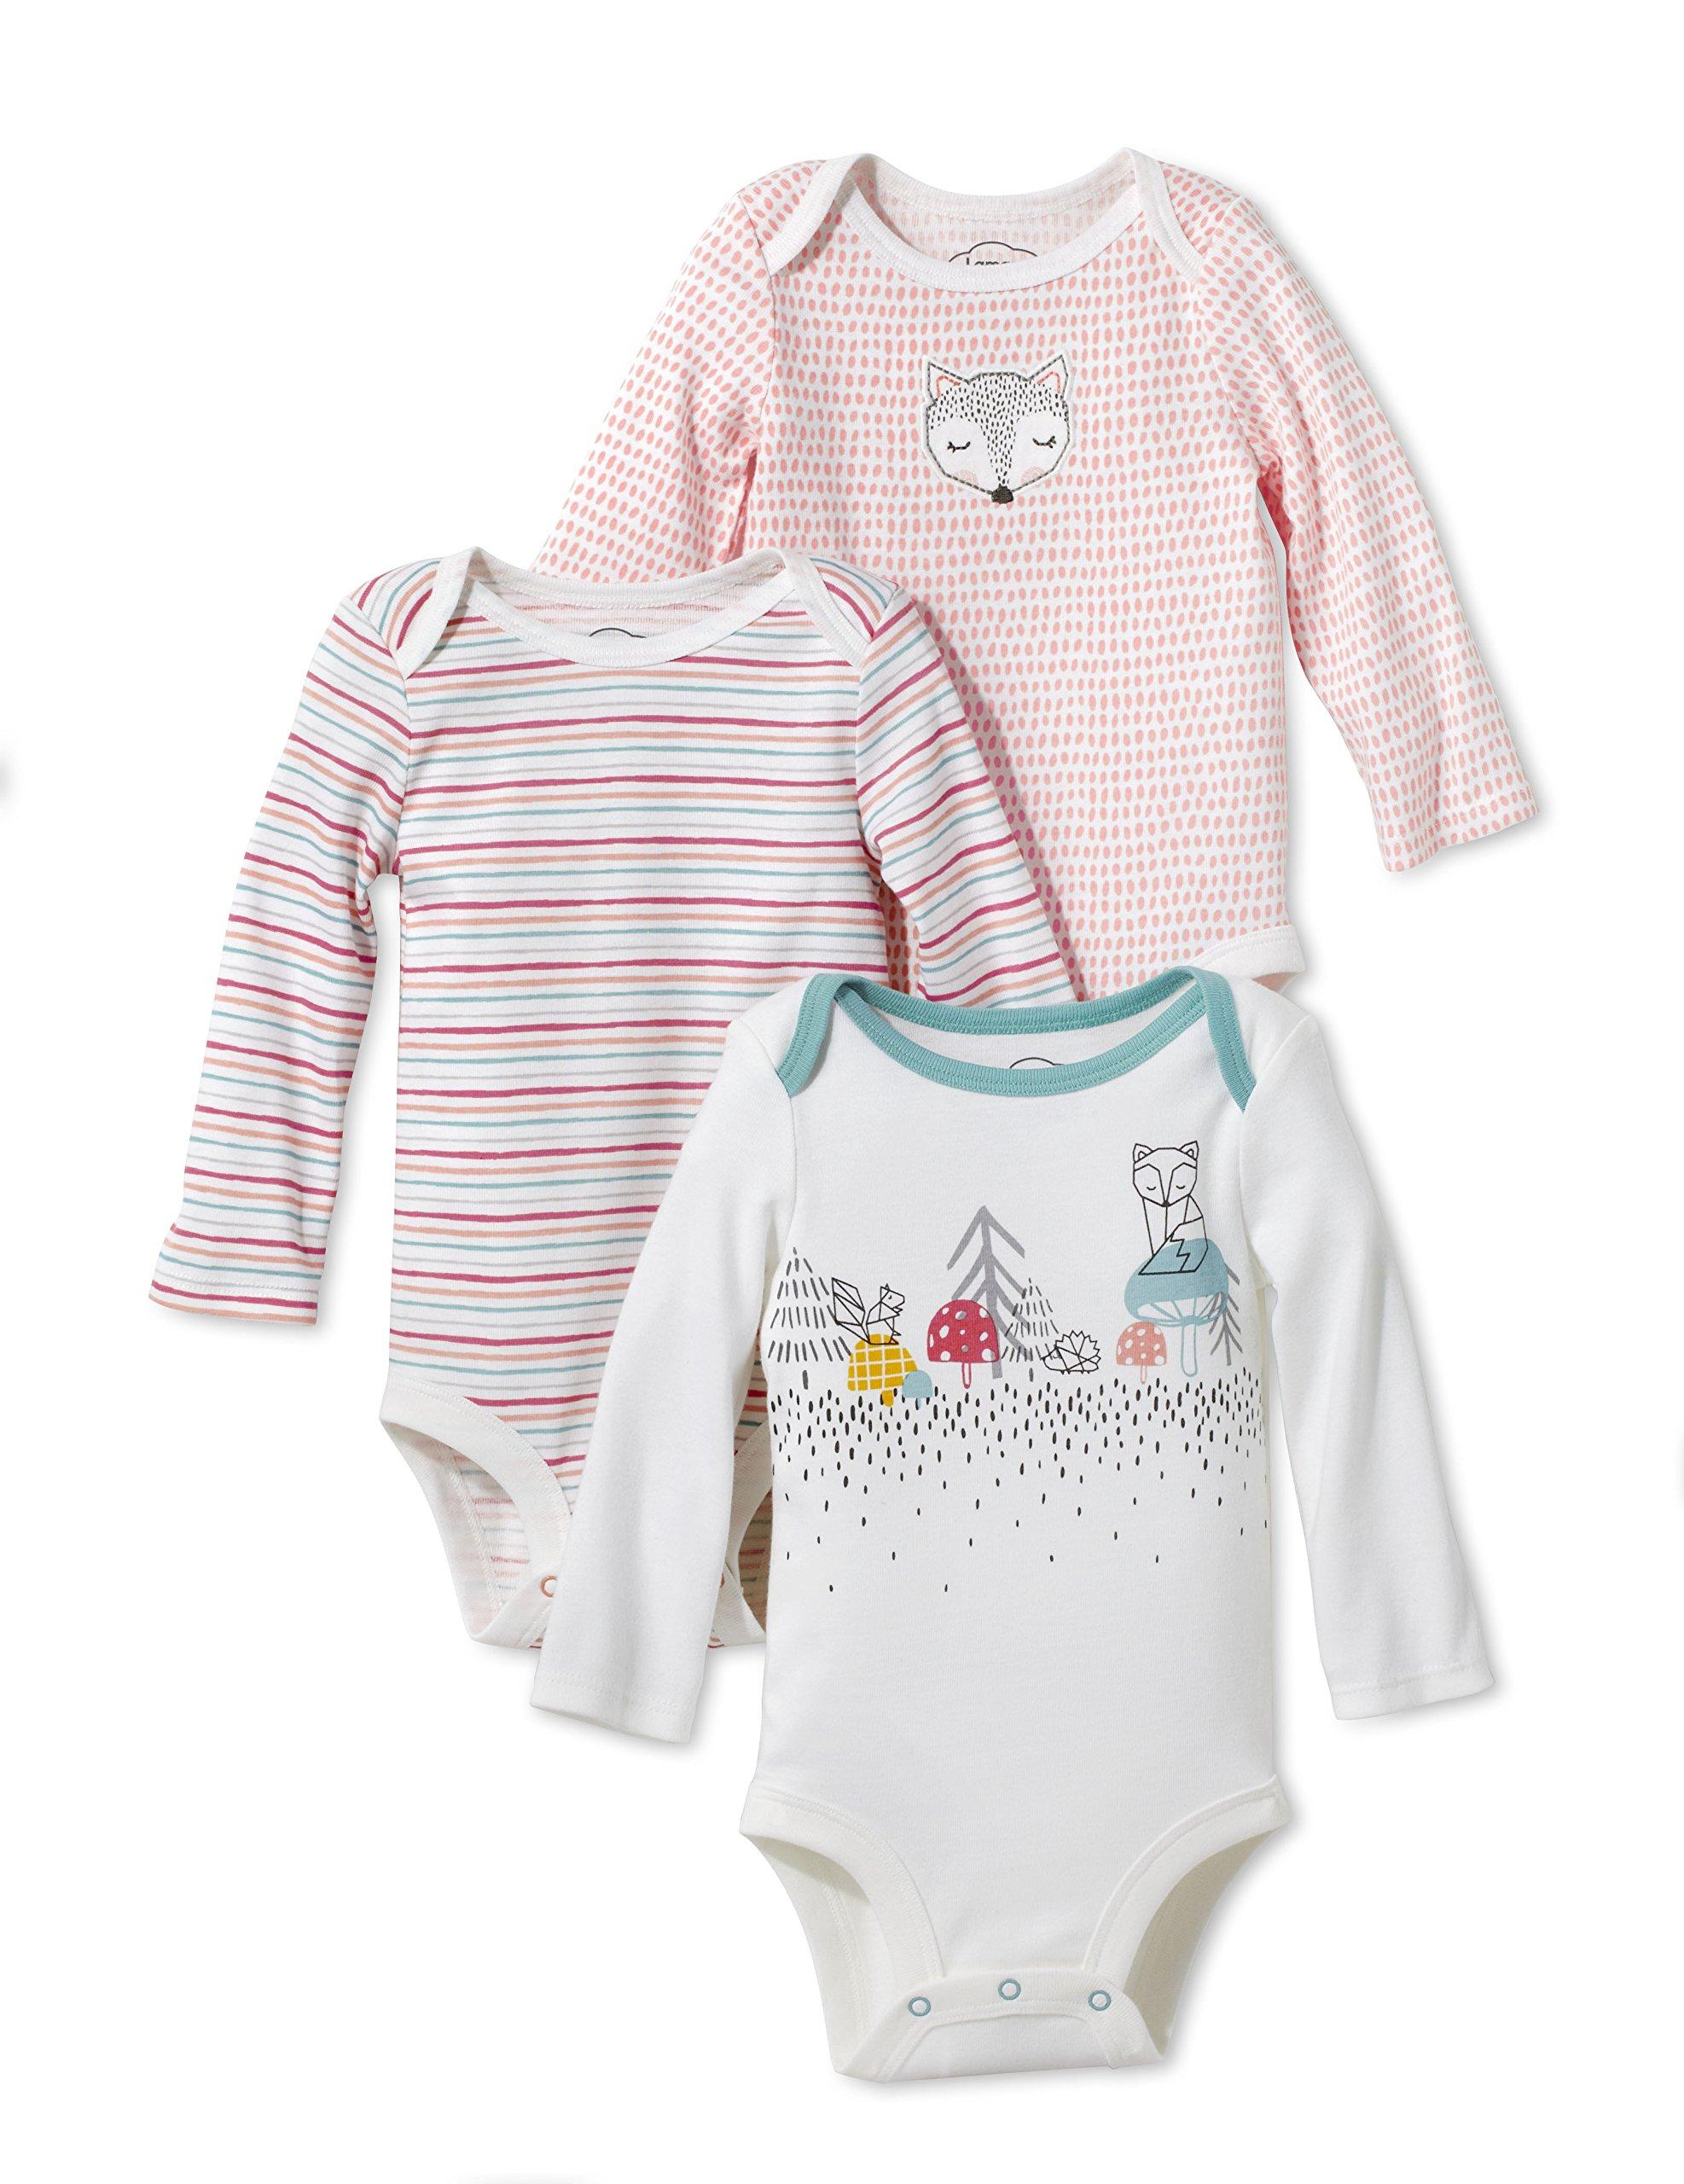 Lamaze Baby Organic 3 Pack Longsleeve Bodysuits, Coral, 18M